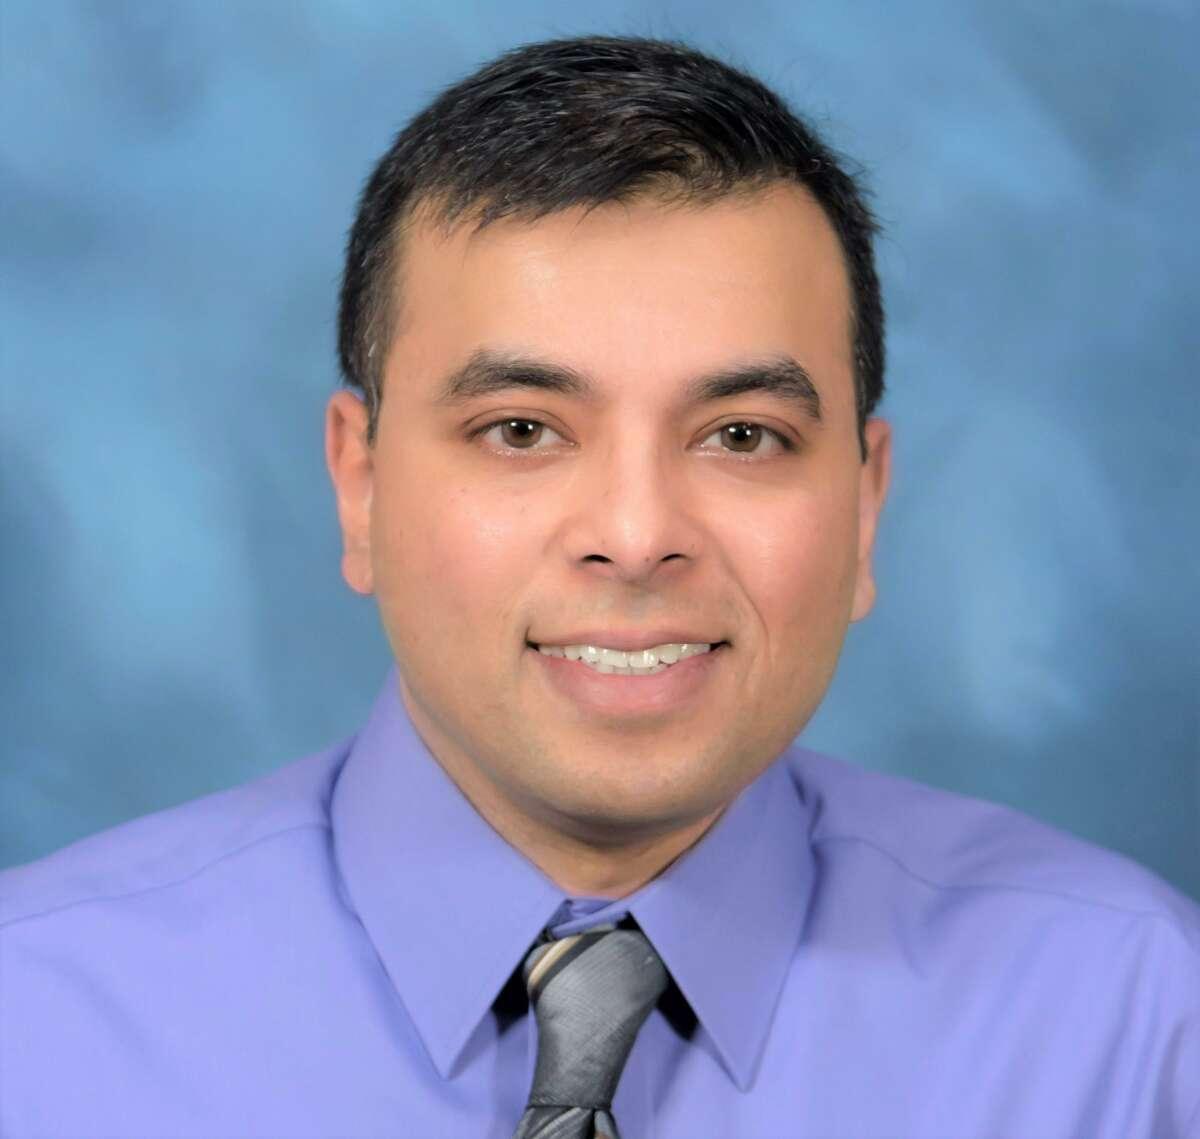 Dr. Nadeem Hussain is Middlesex Health's chief of gastroenterology.